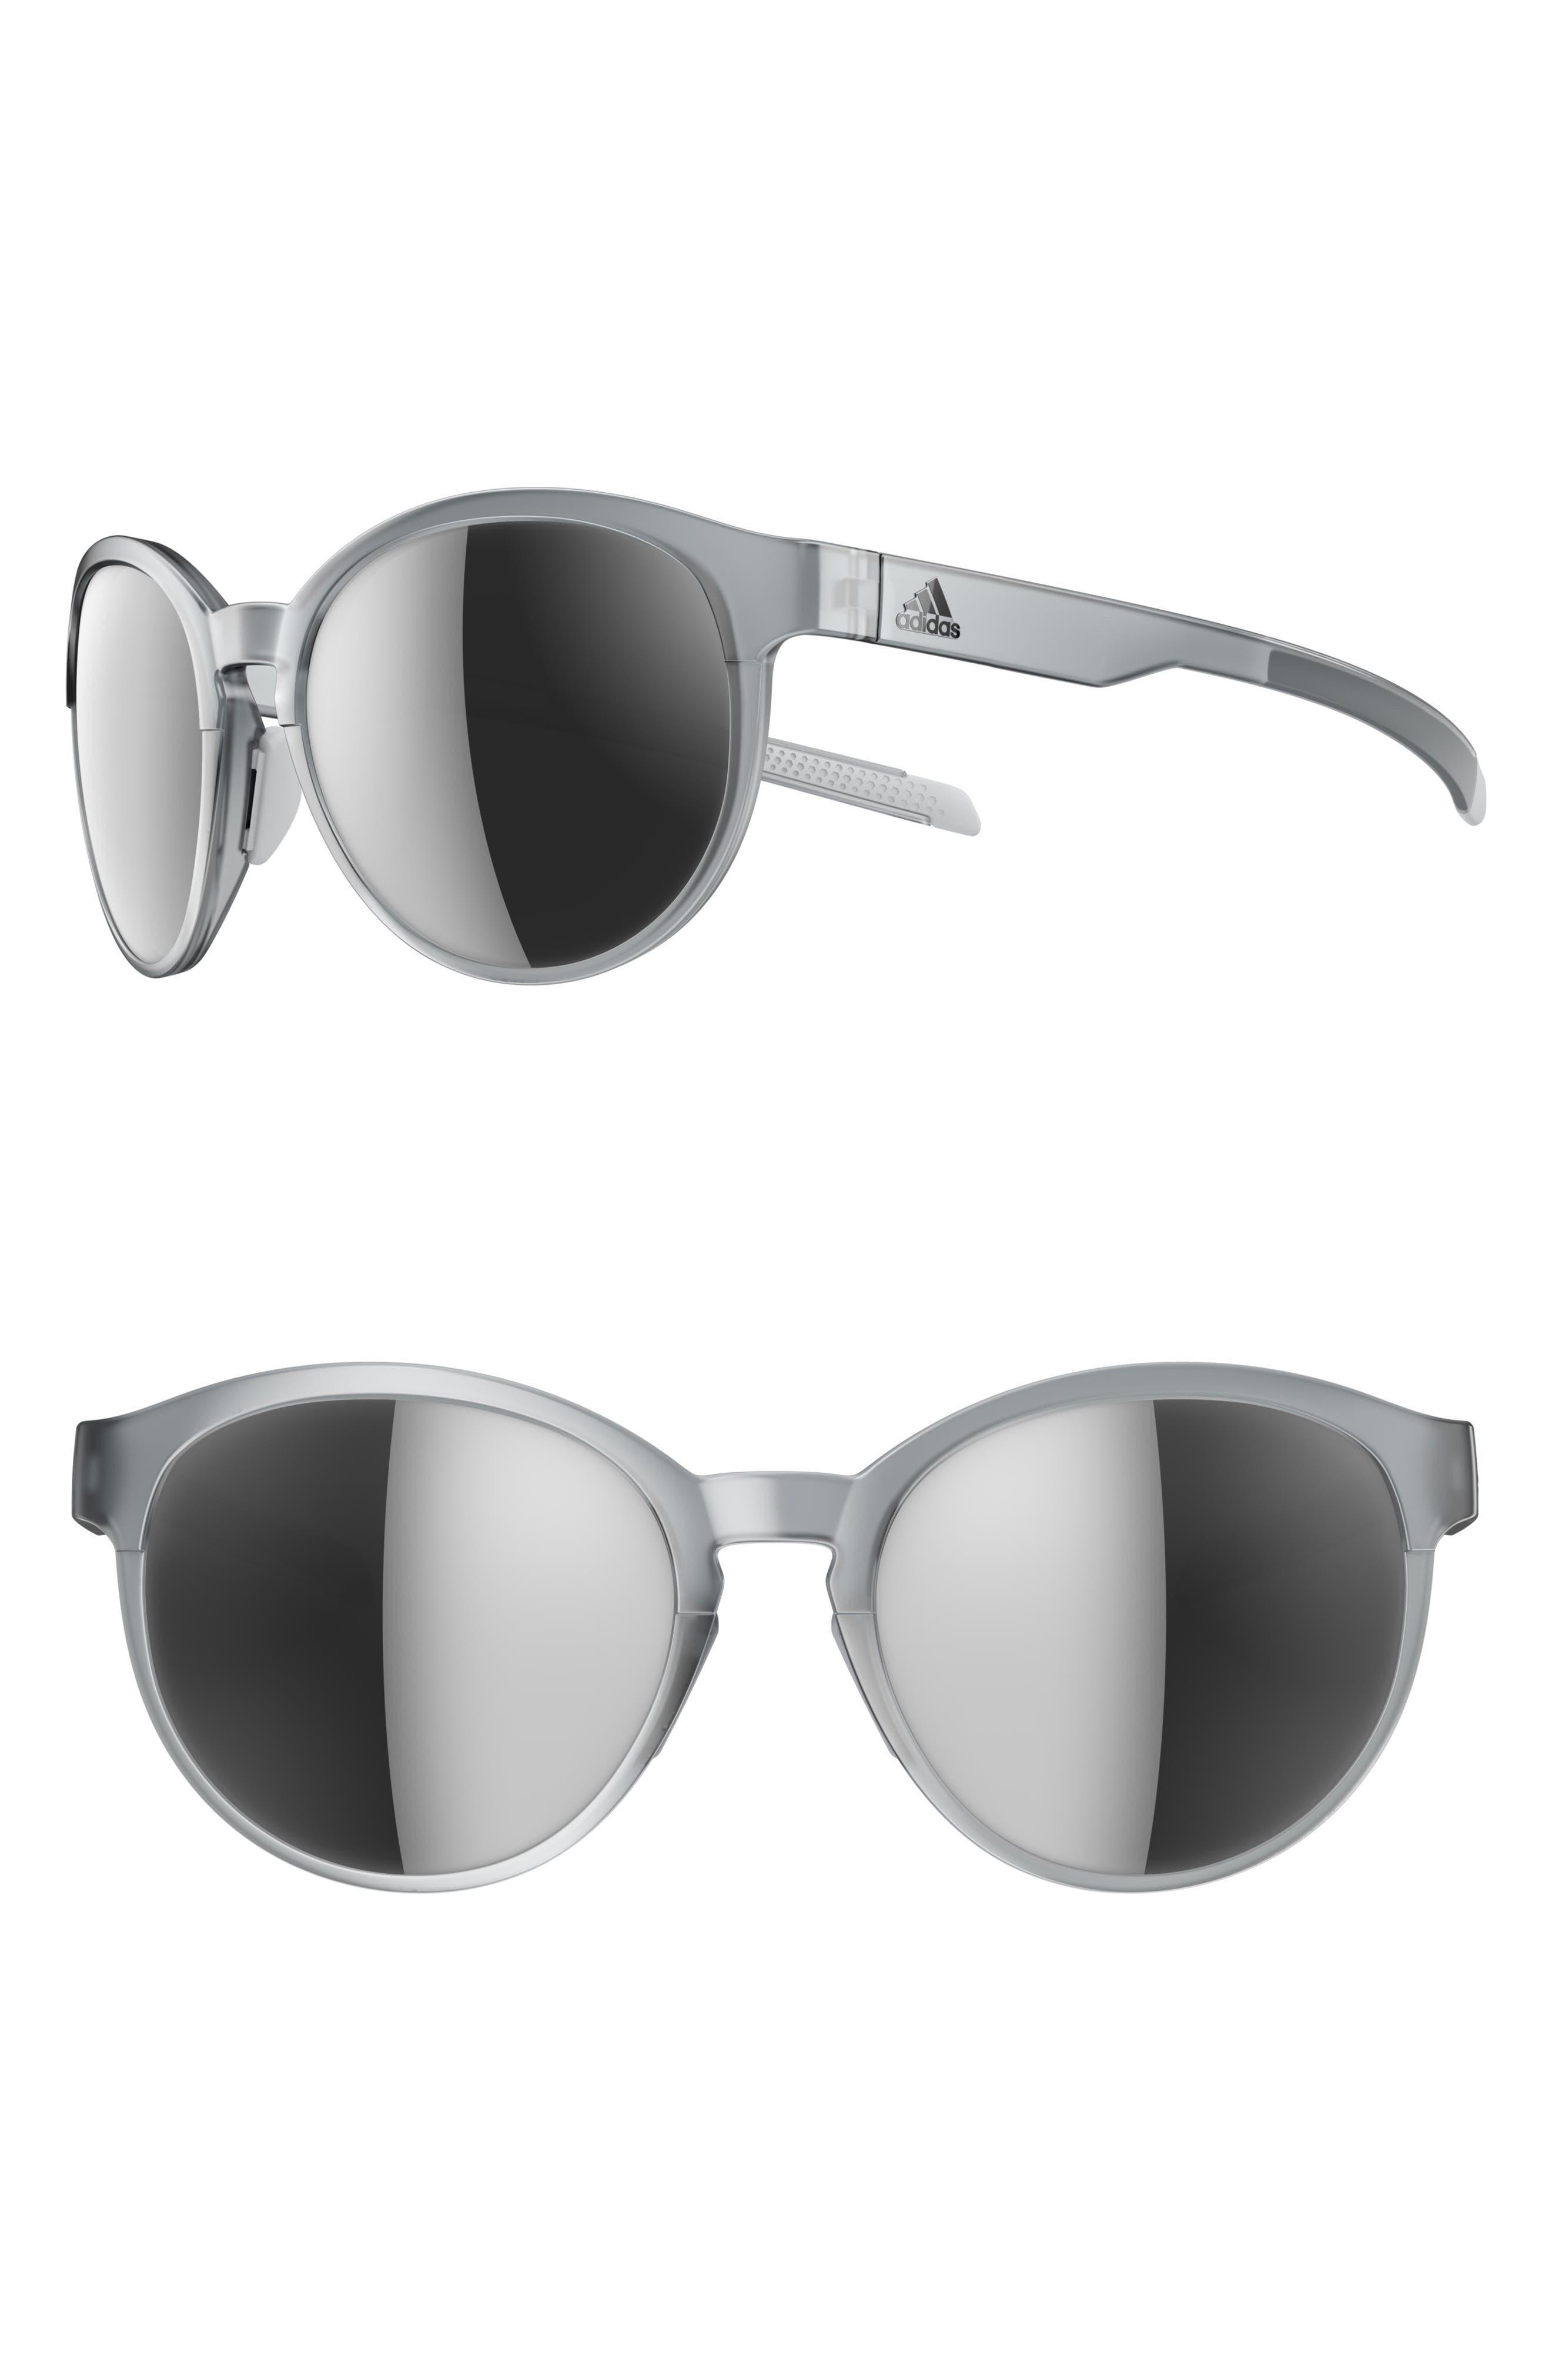 ADIDAS, Beyonder 55mm Mirrored Training Sunglasses, Main thumbnail 1, color, CRYSTAL GREY/ CHROME